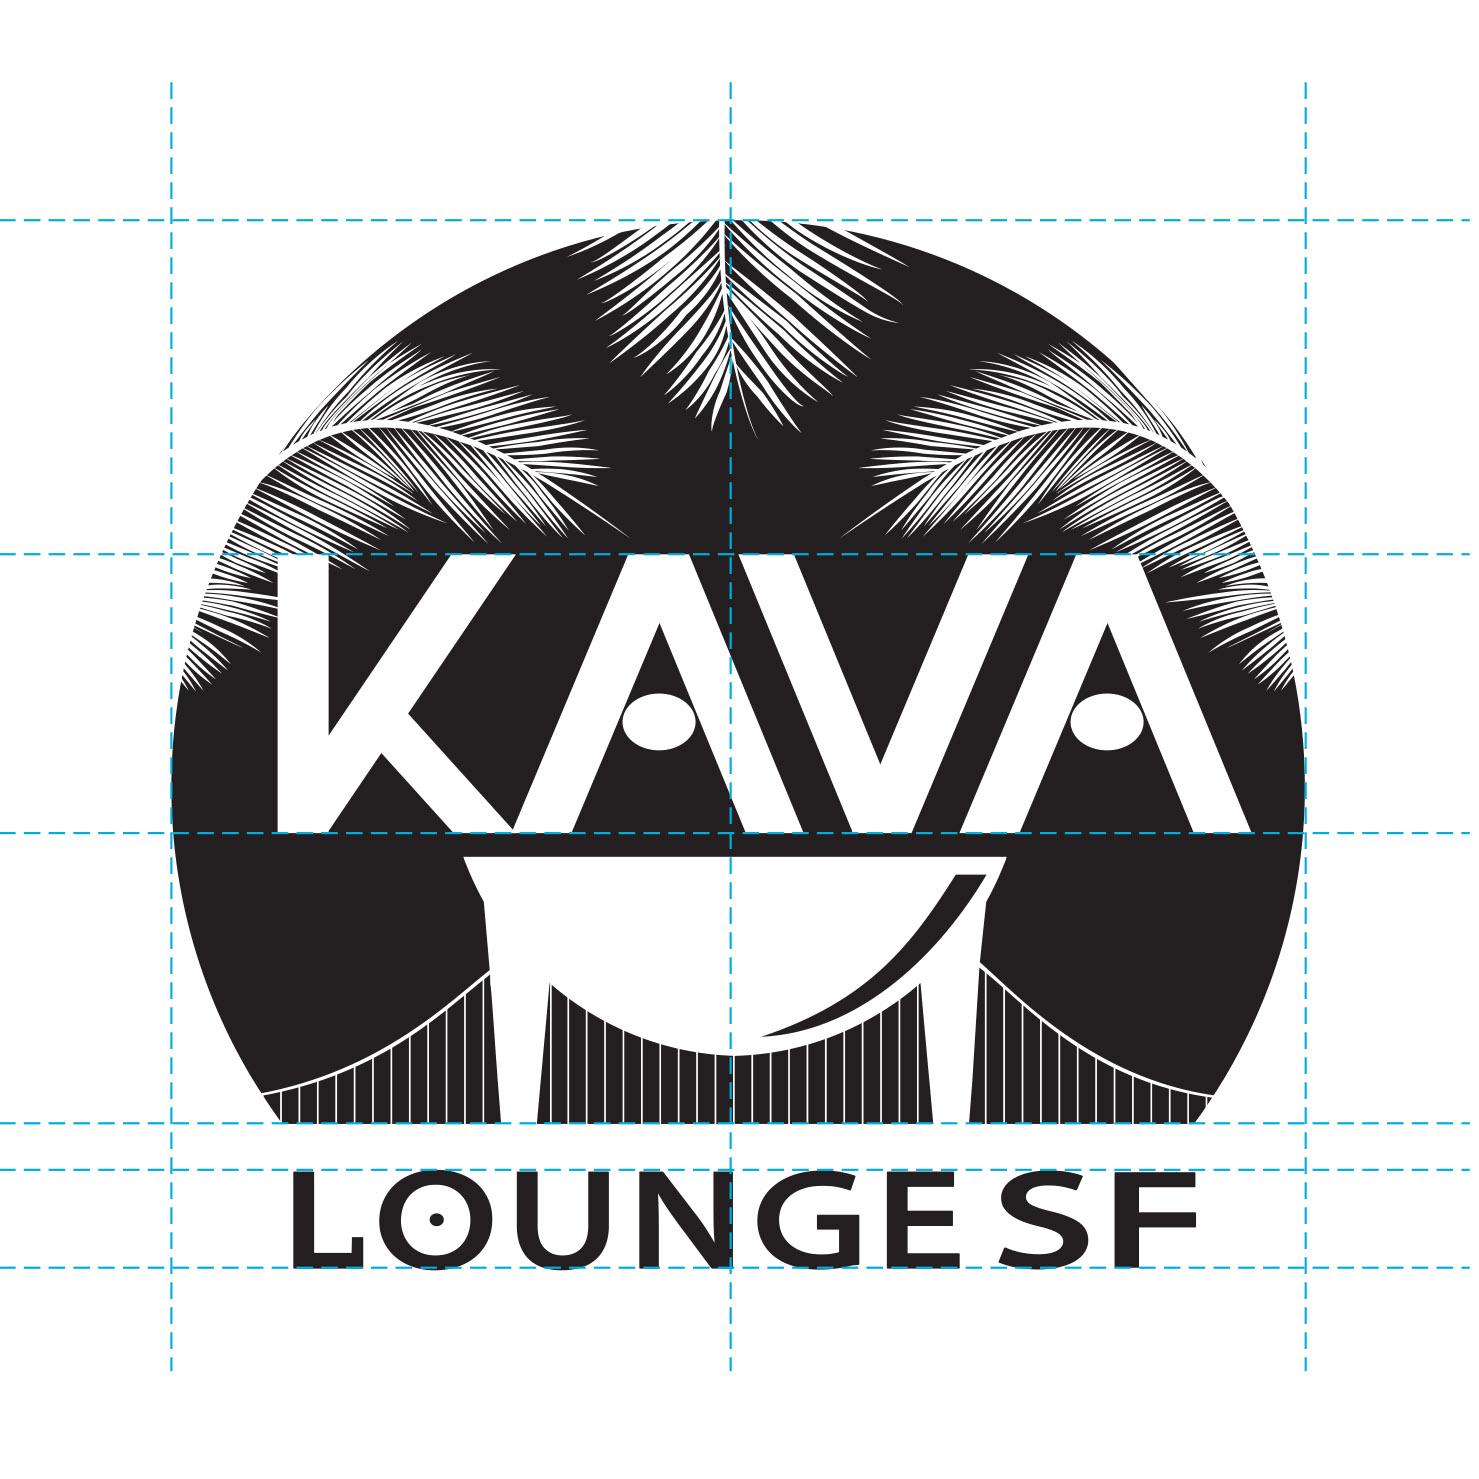 Logos_kava blueprint.jpg